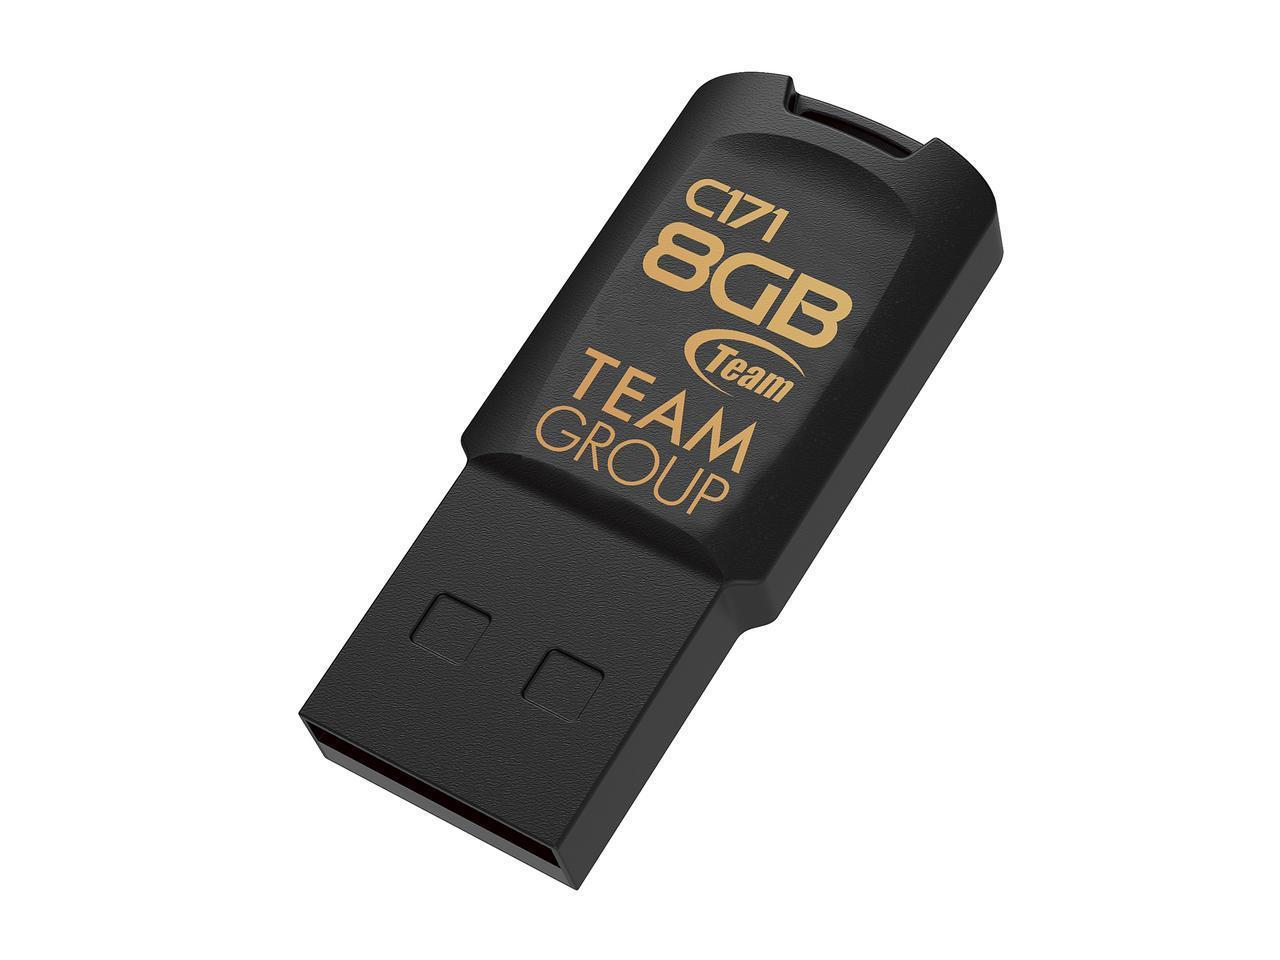 USB памет Team Group C171, 8GB, USB 2.0, Черен-2